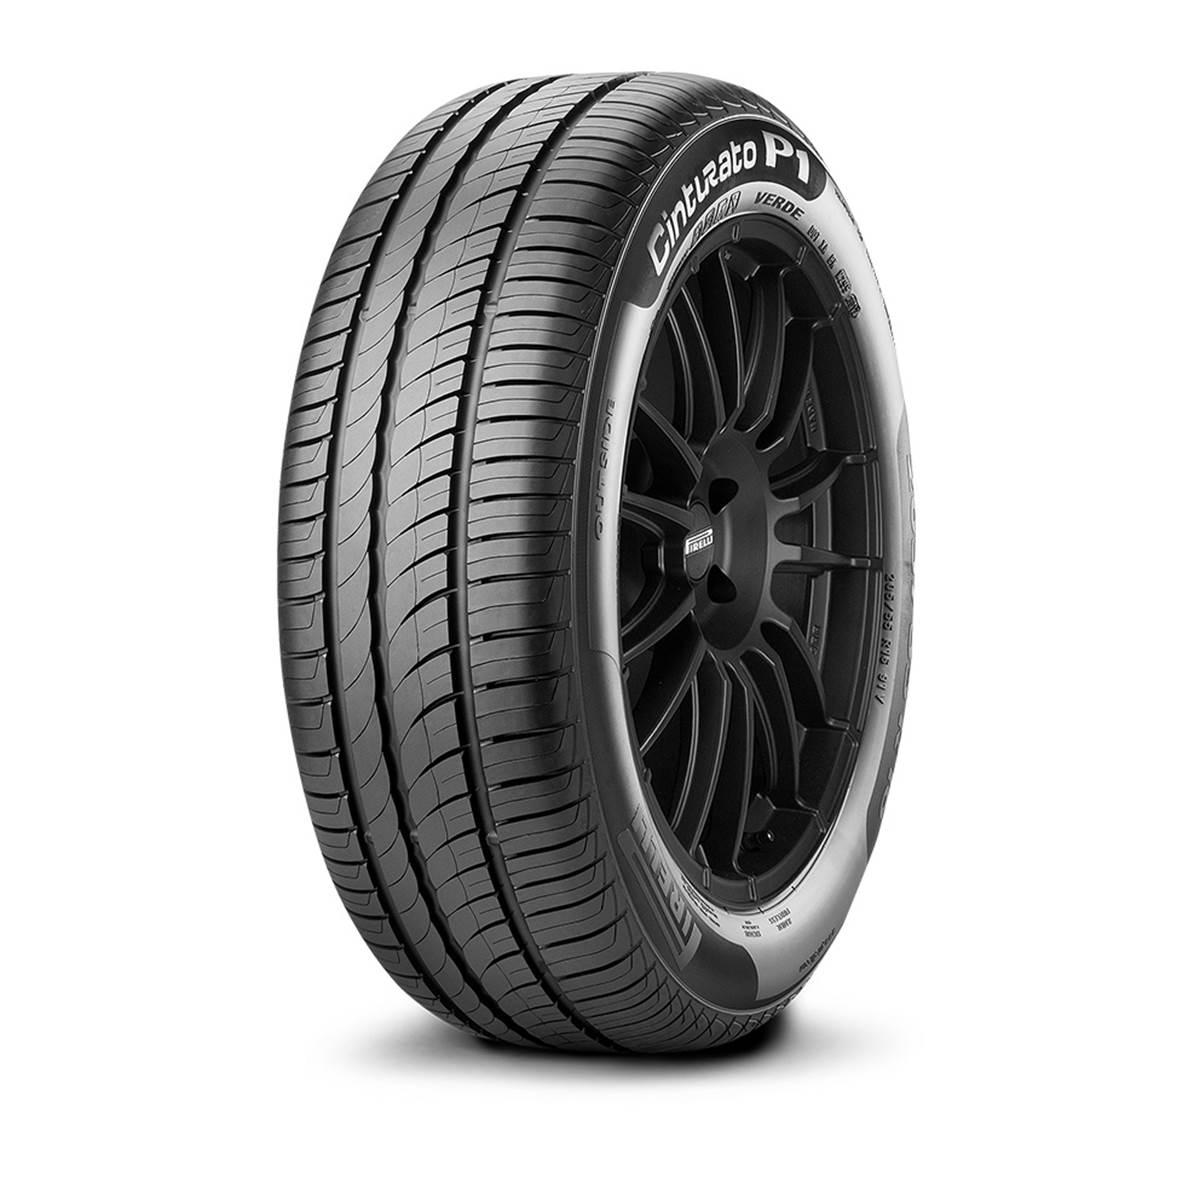 Pneu Pirelli 185/65R15 88T Cinturato P1 Verde